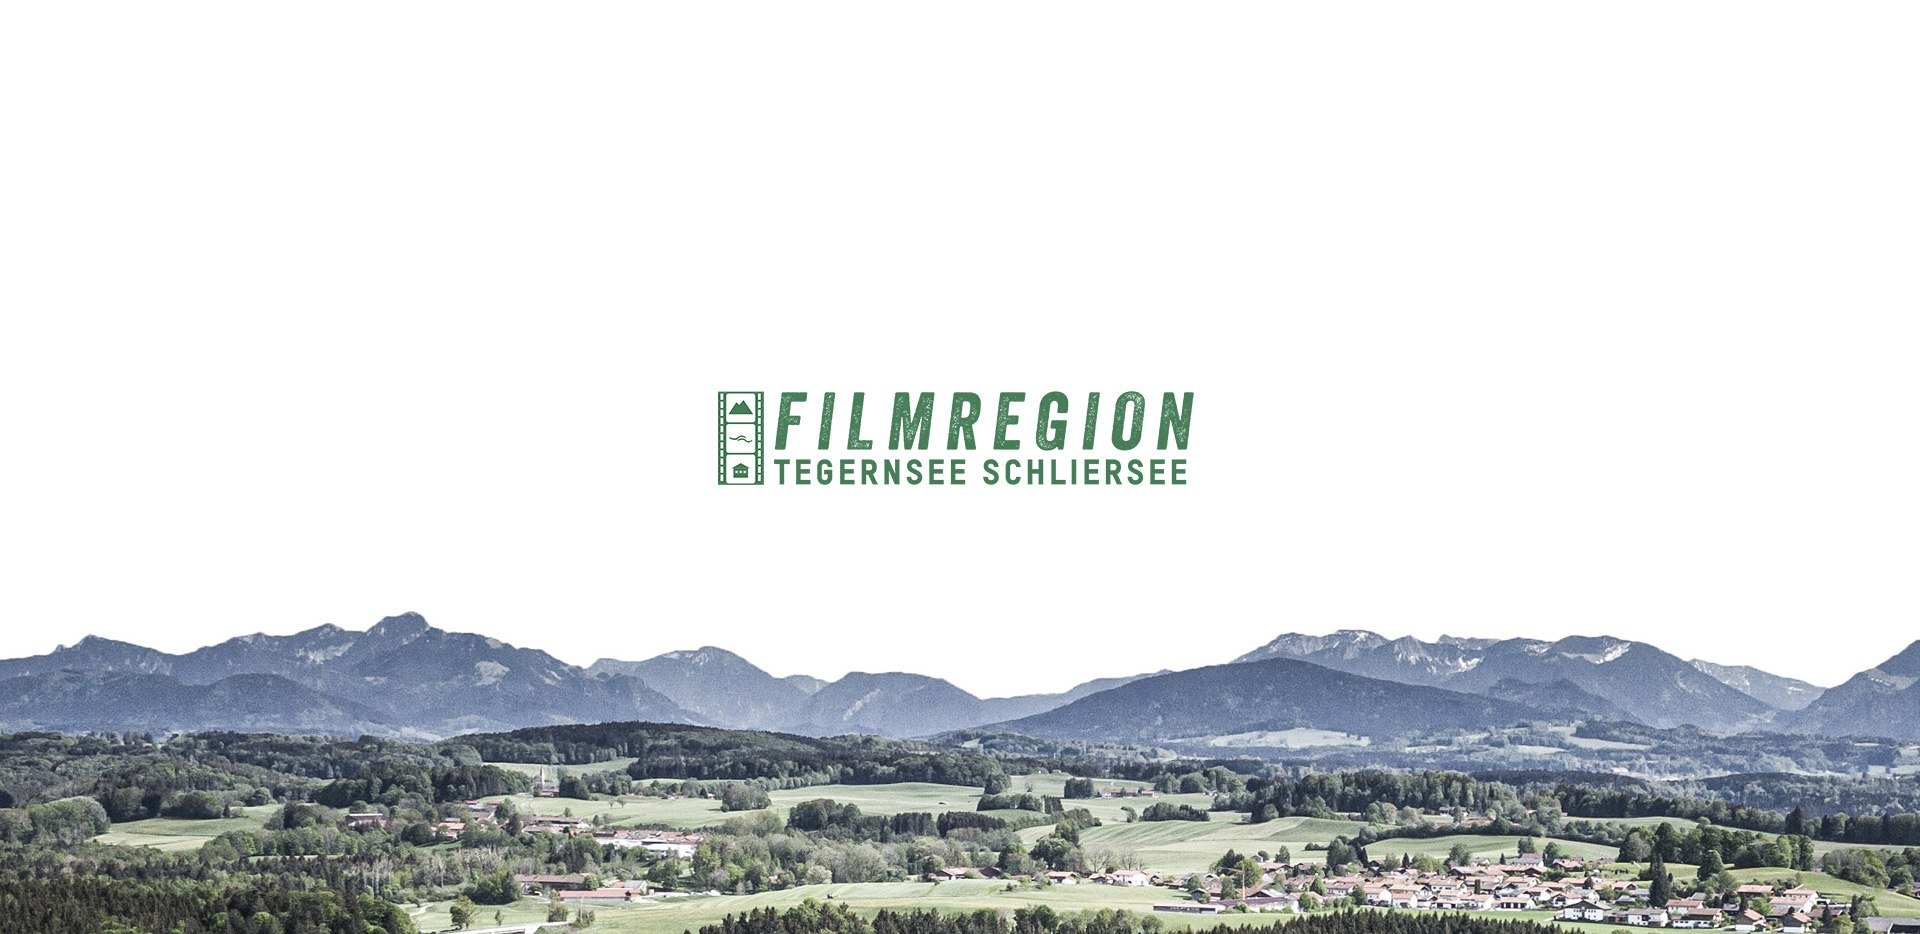 Filmregion Tegernsee Schliersee, © Dietmar Denger